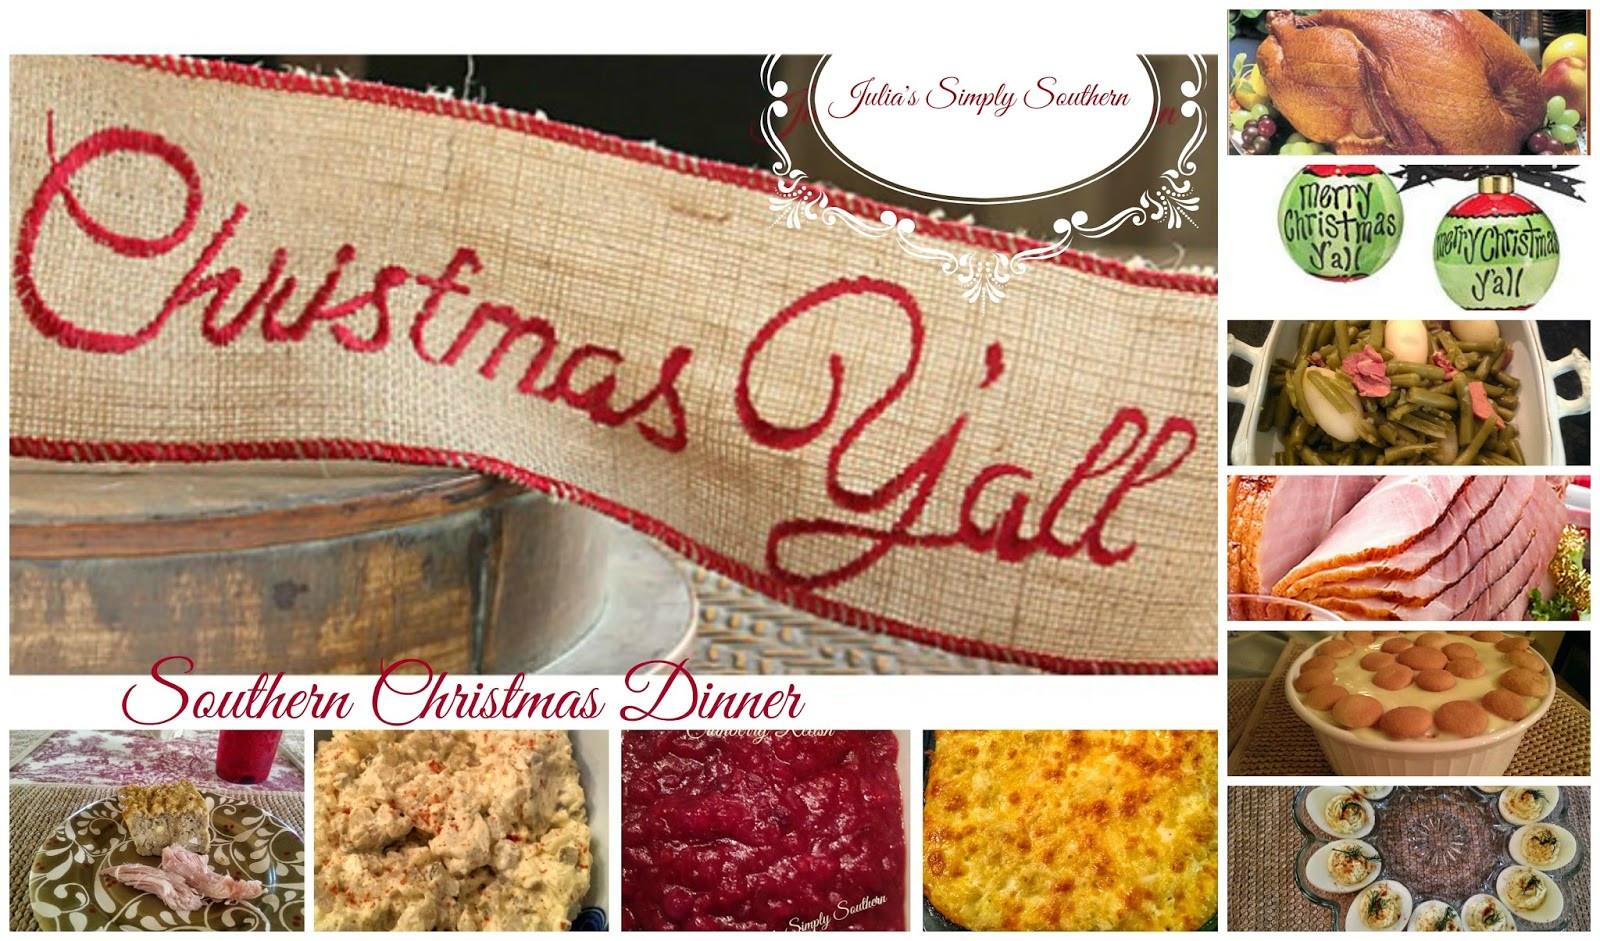 Southern Christmas Dinner Menu Ideas  Julia s Simply Southern Southern Christmas Dinner Recipes